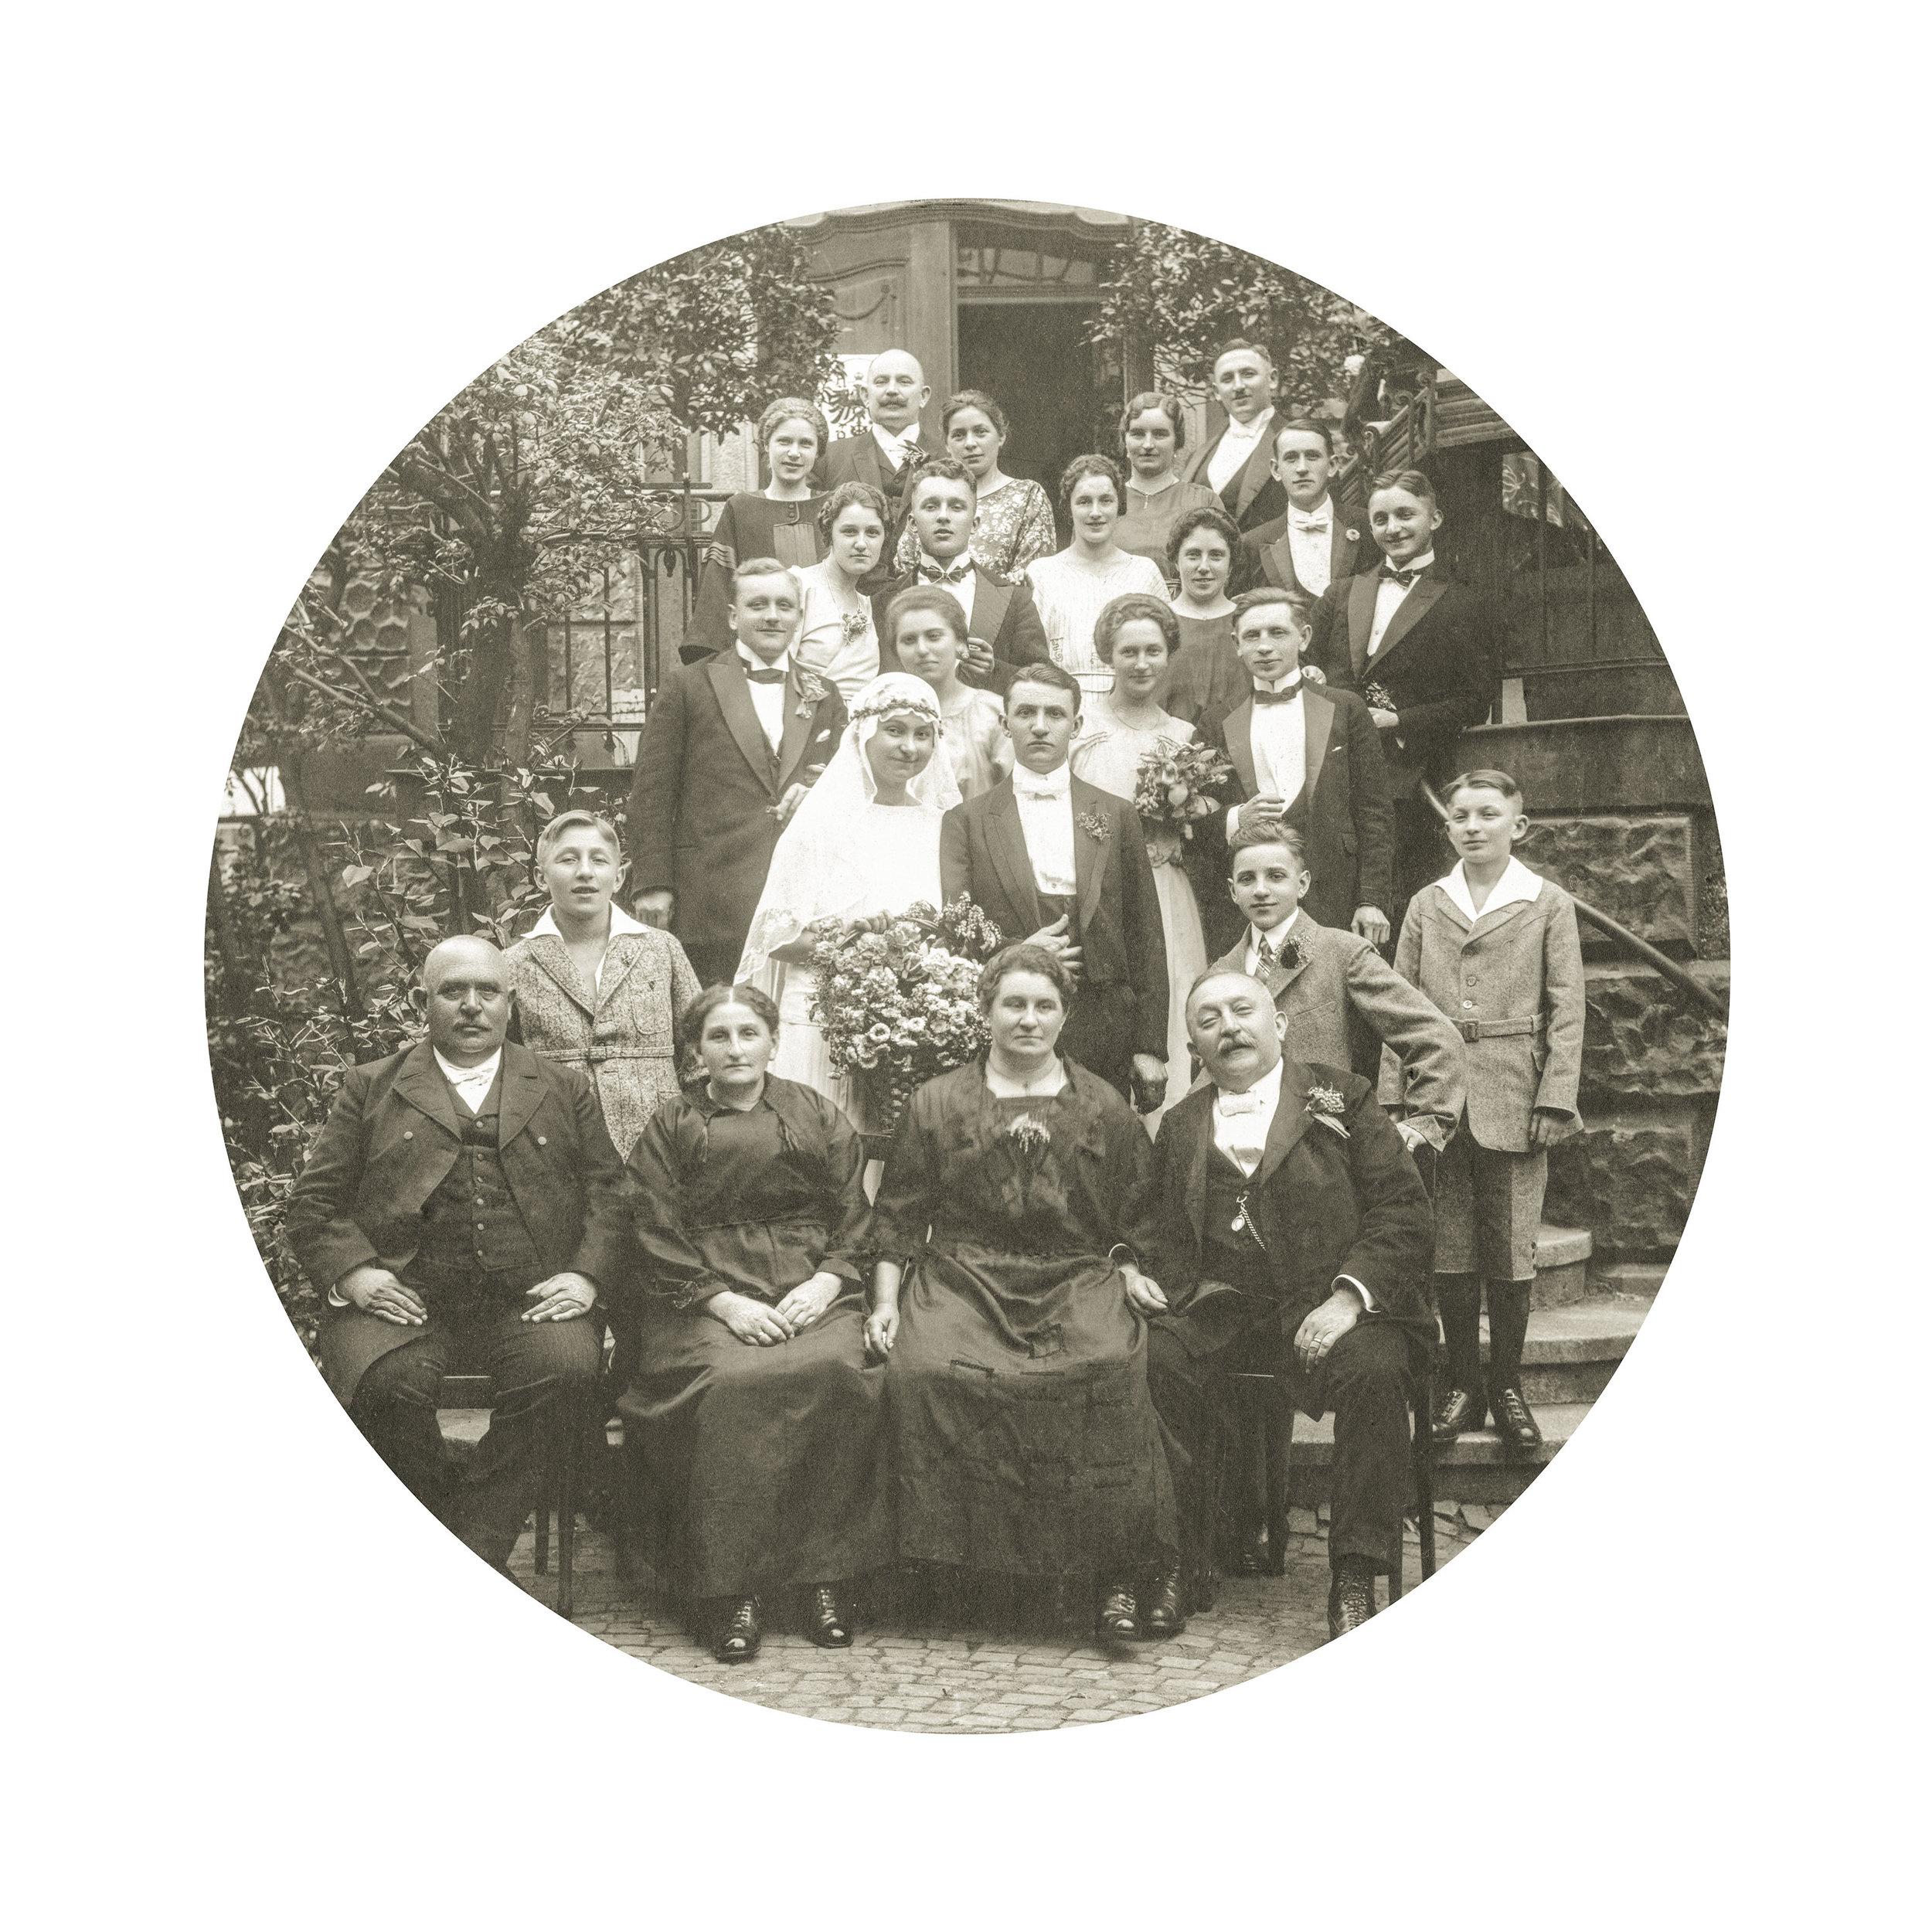 Sonneberg Germany, 1922